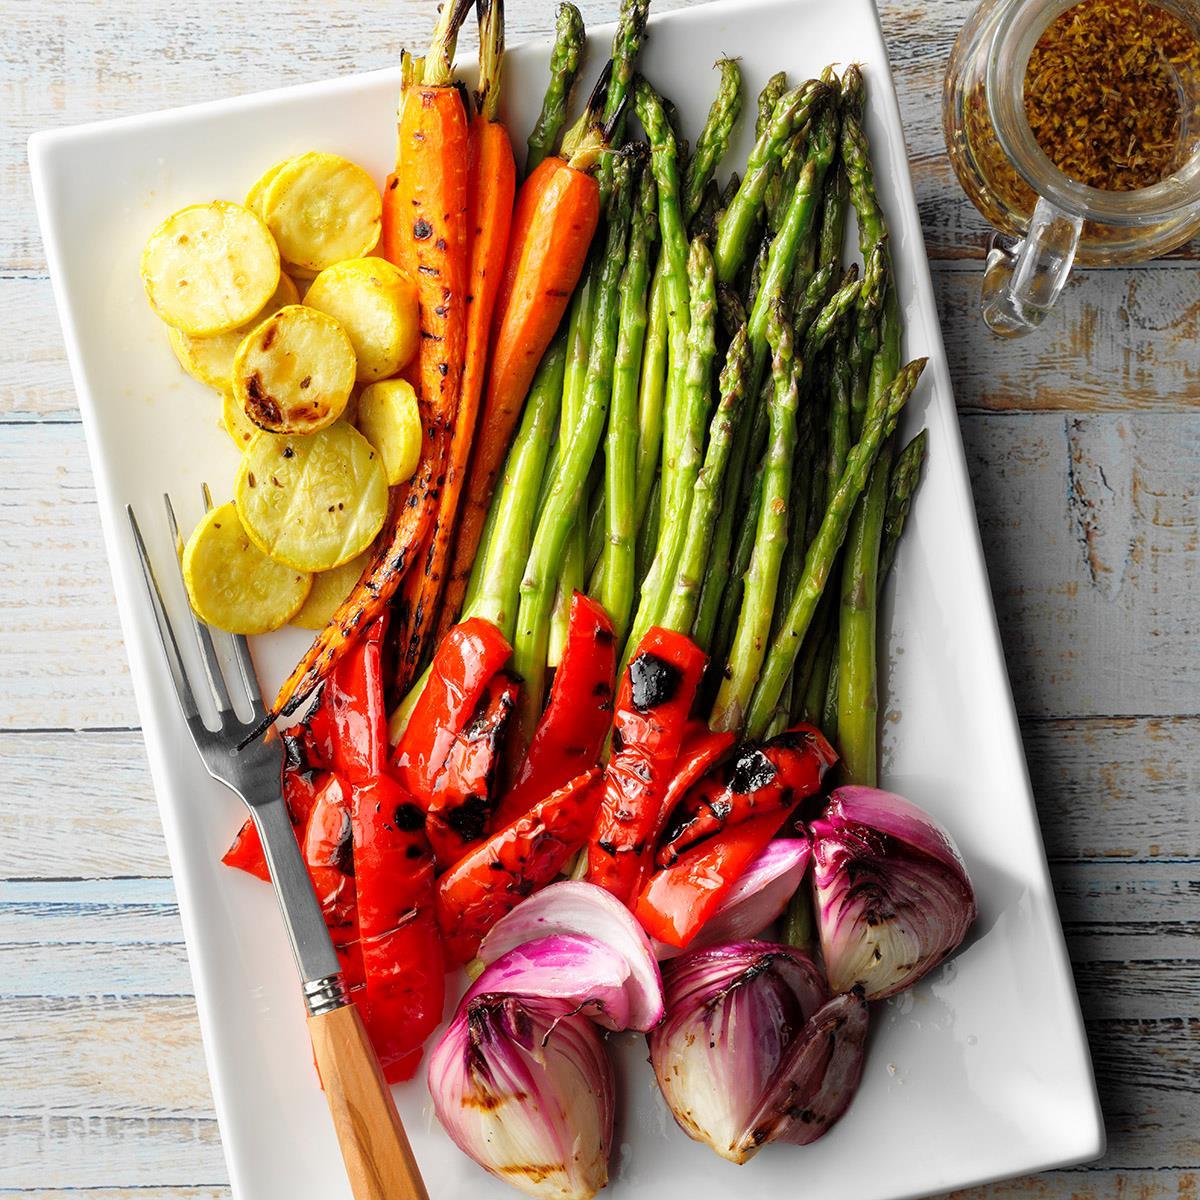 Grilled Vegetable Platter Recipe How To Make It Taste Of Home